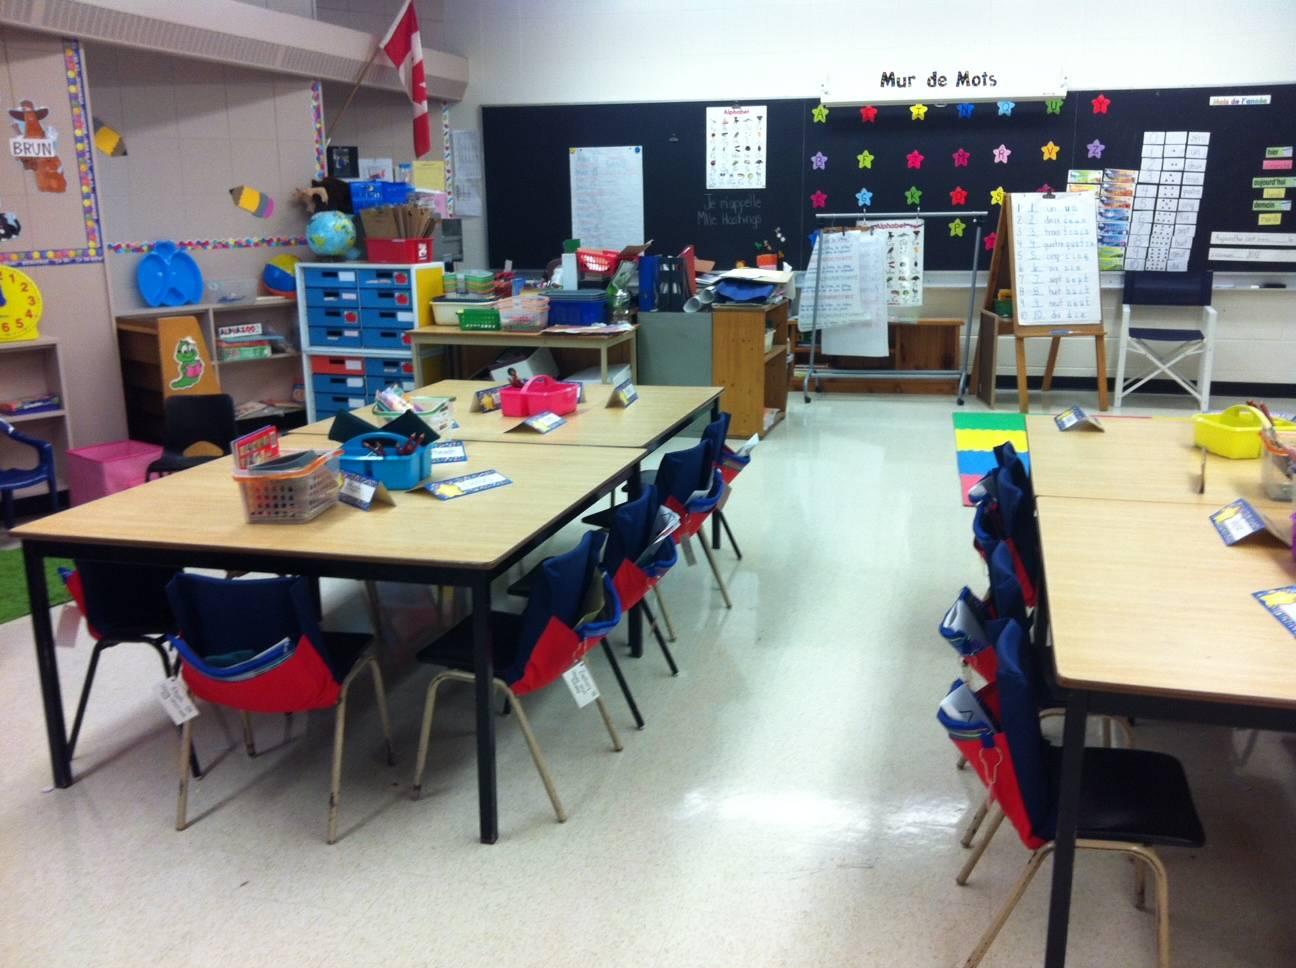 Laura's classroom